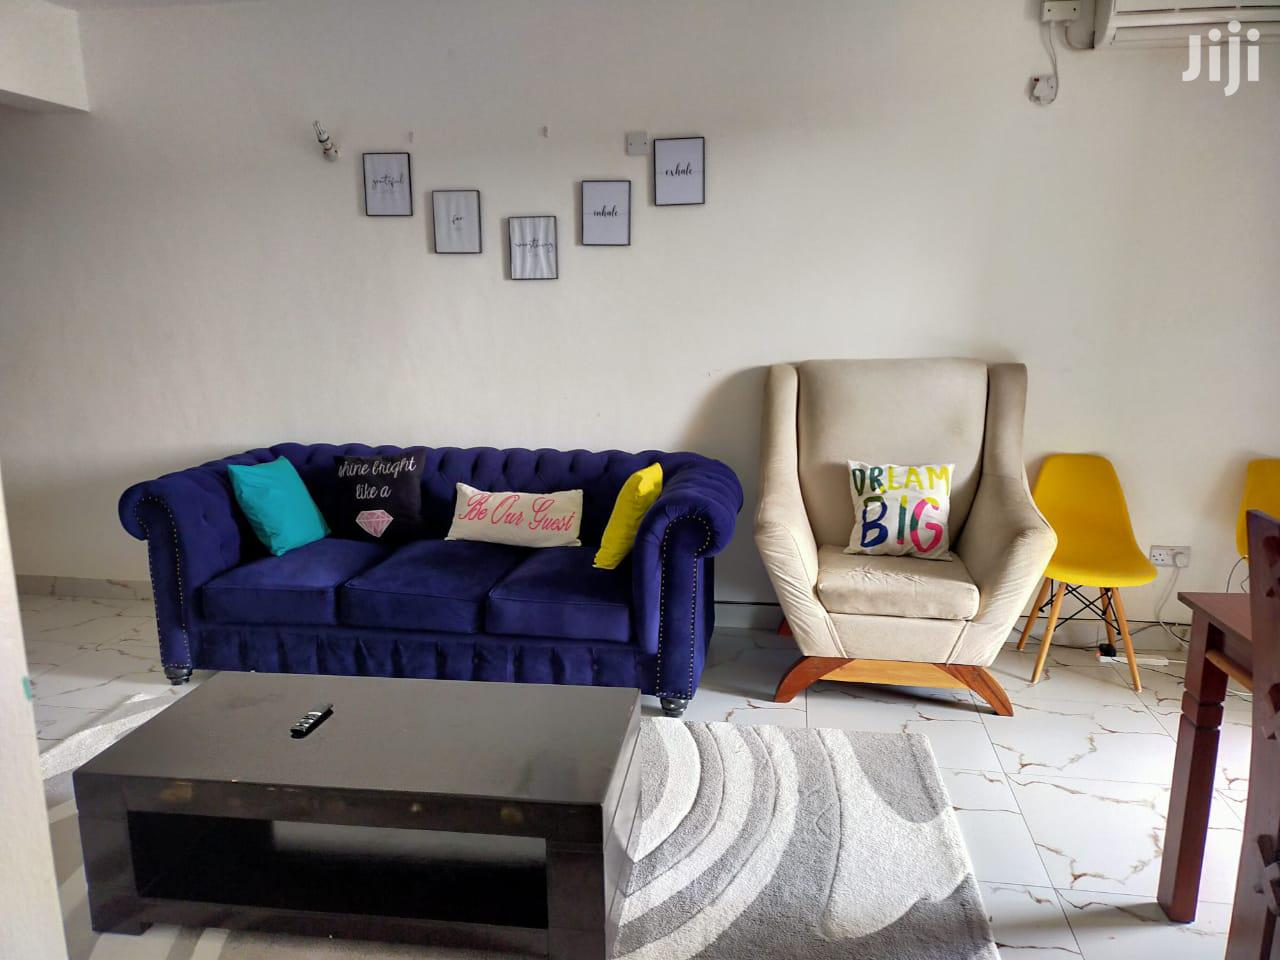 3 Bedrooms Furnished Apartment | Short Let for sale in Nyali, Mombasa, Kenya